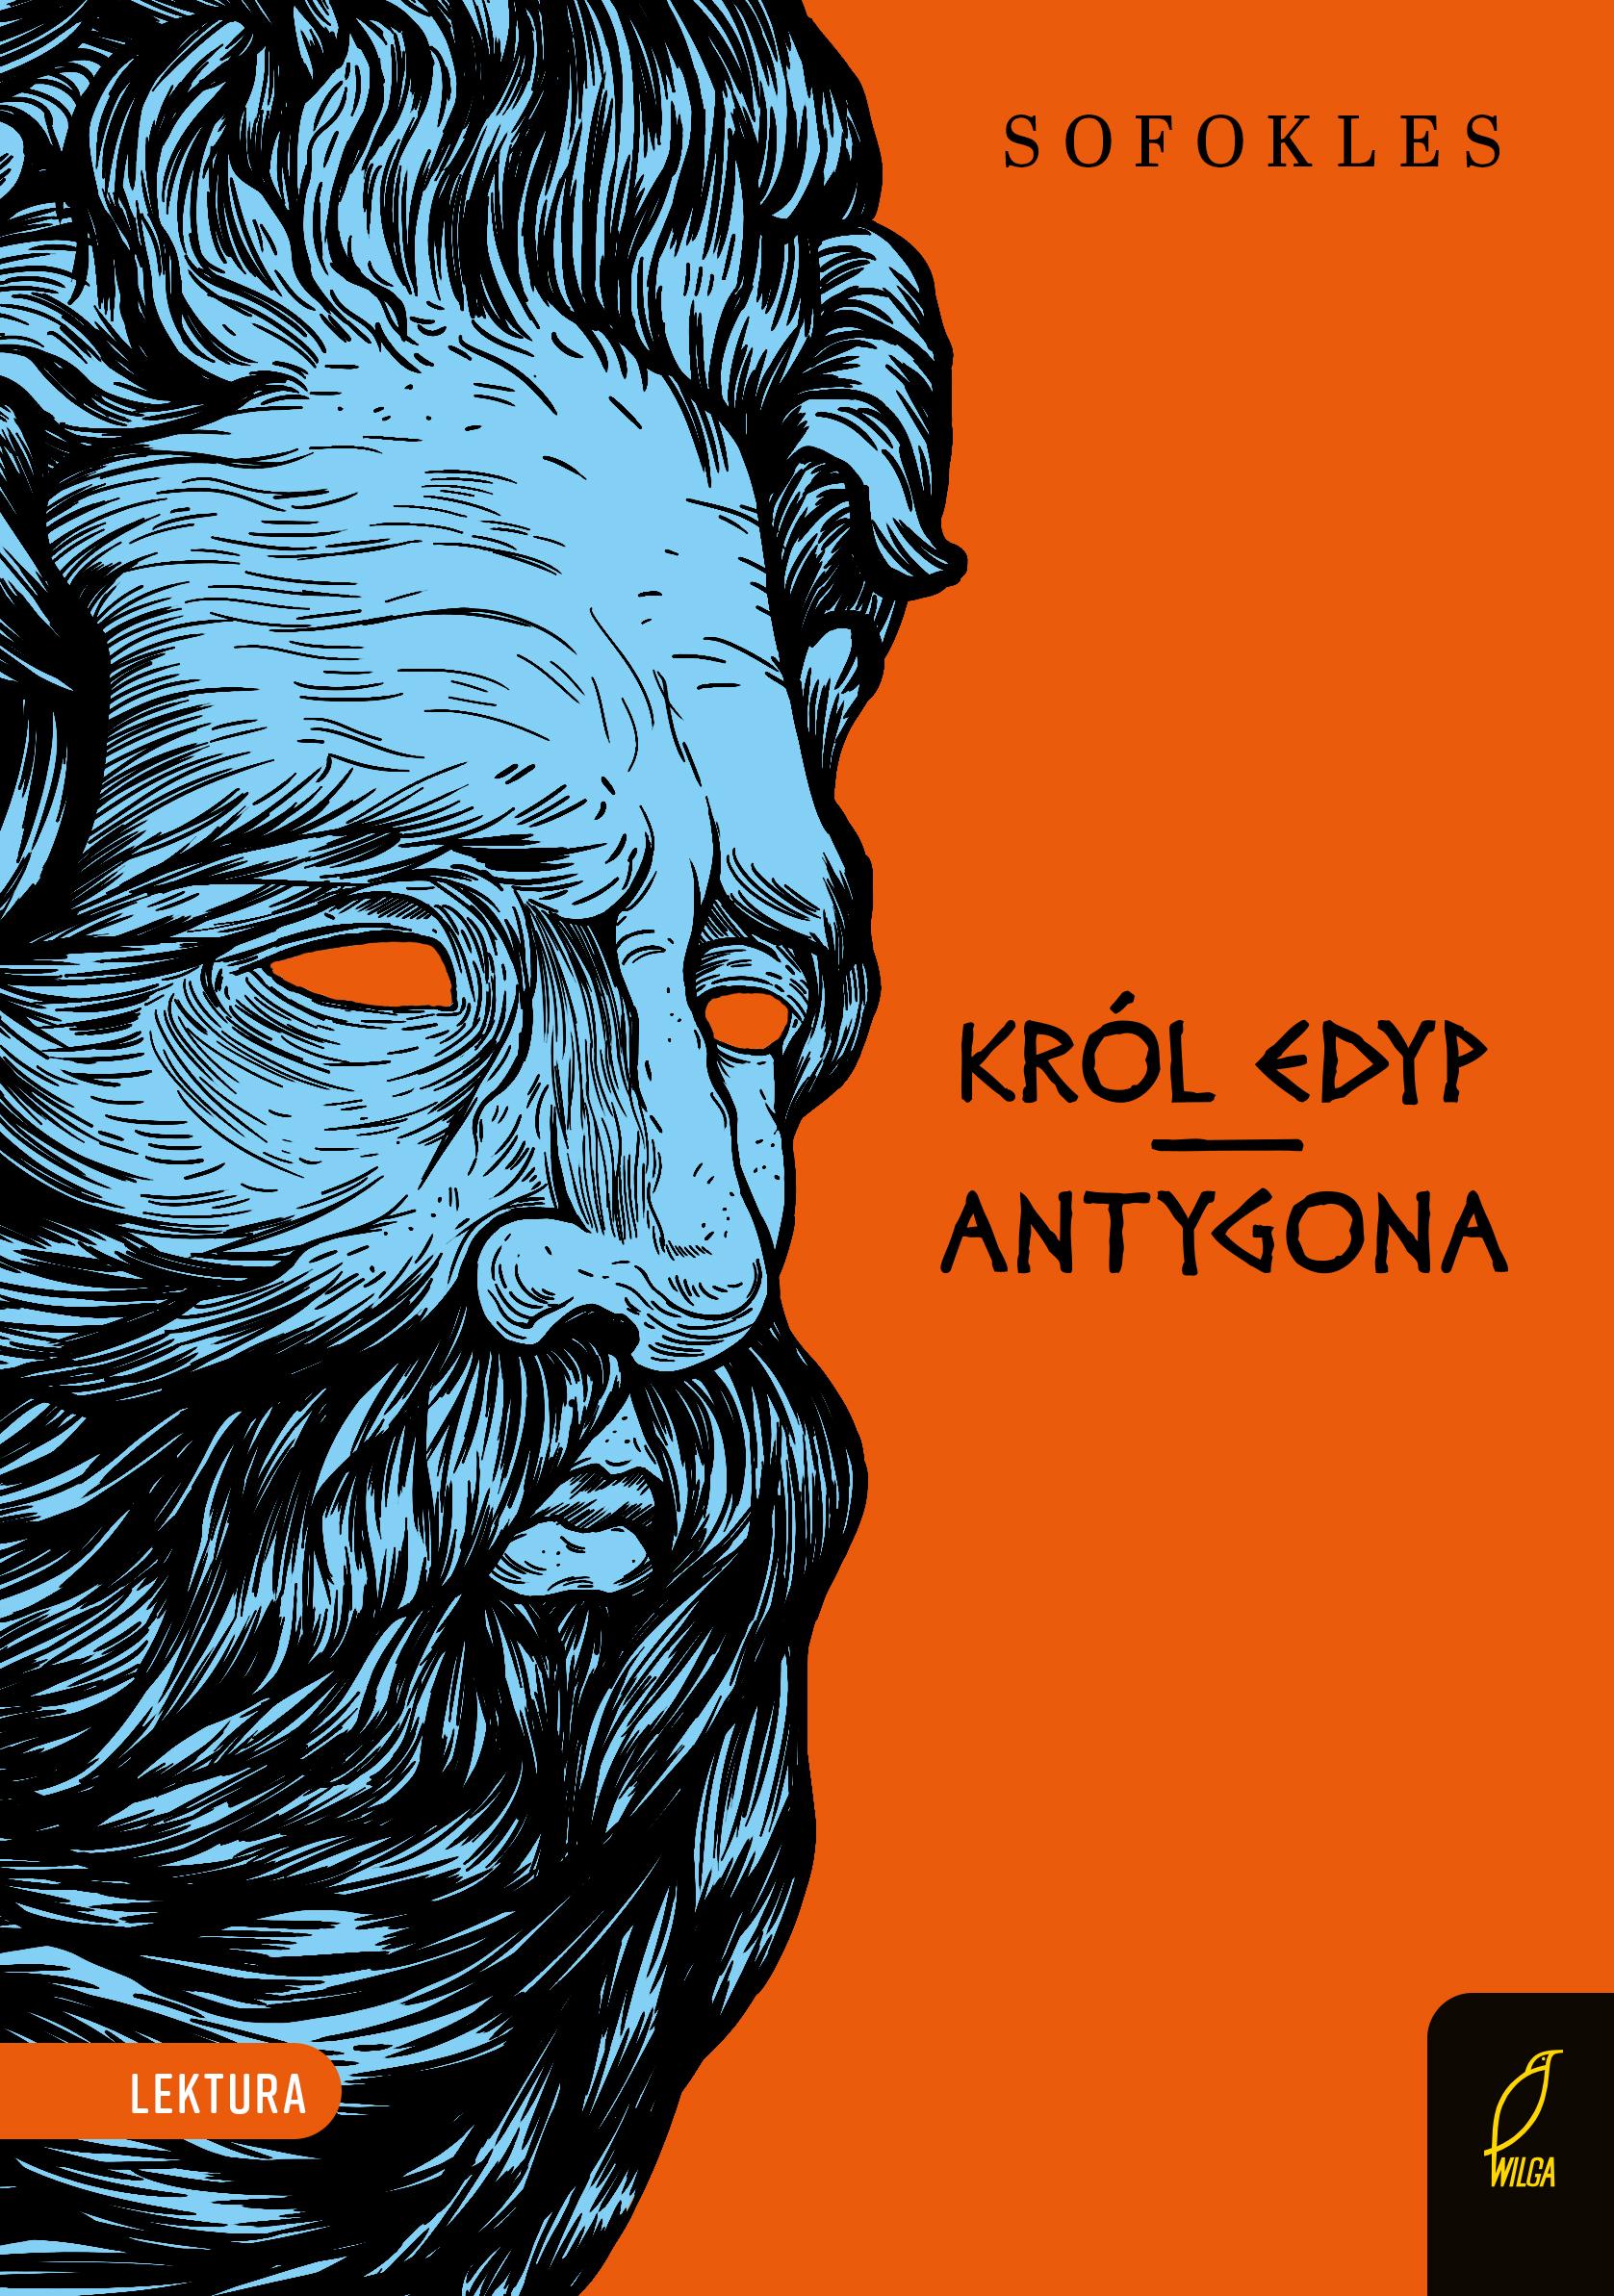 Król Edyp, Antygona